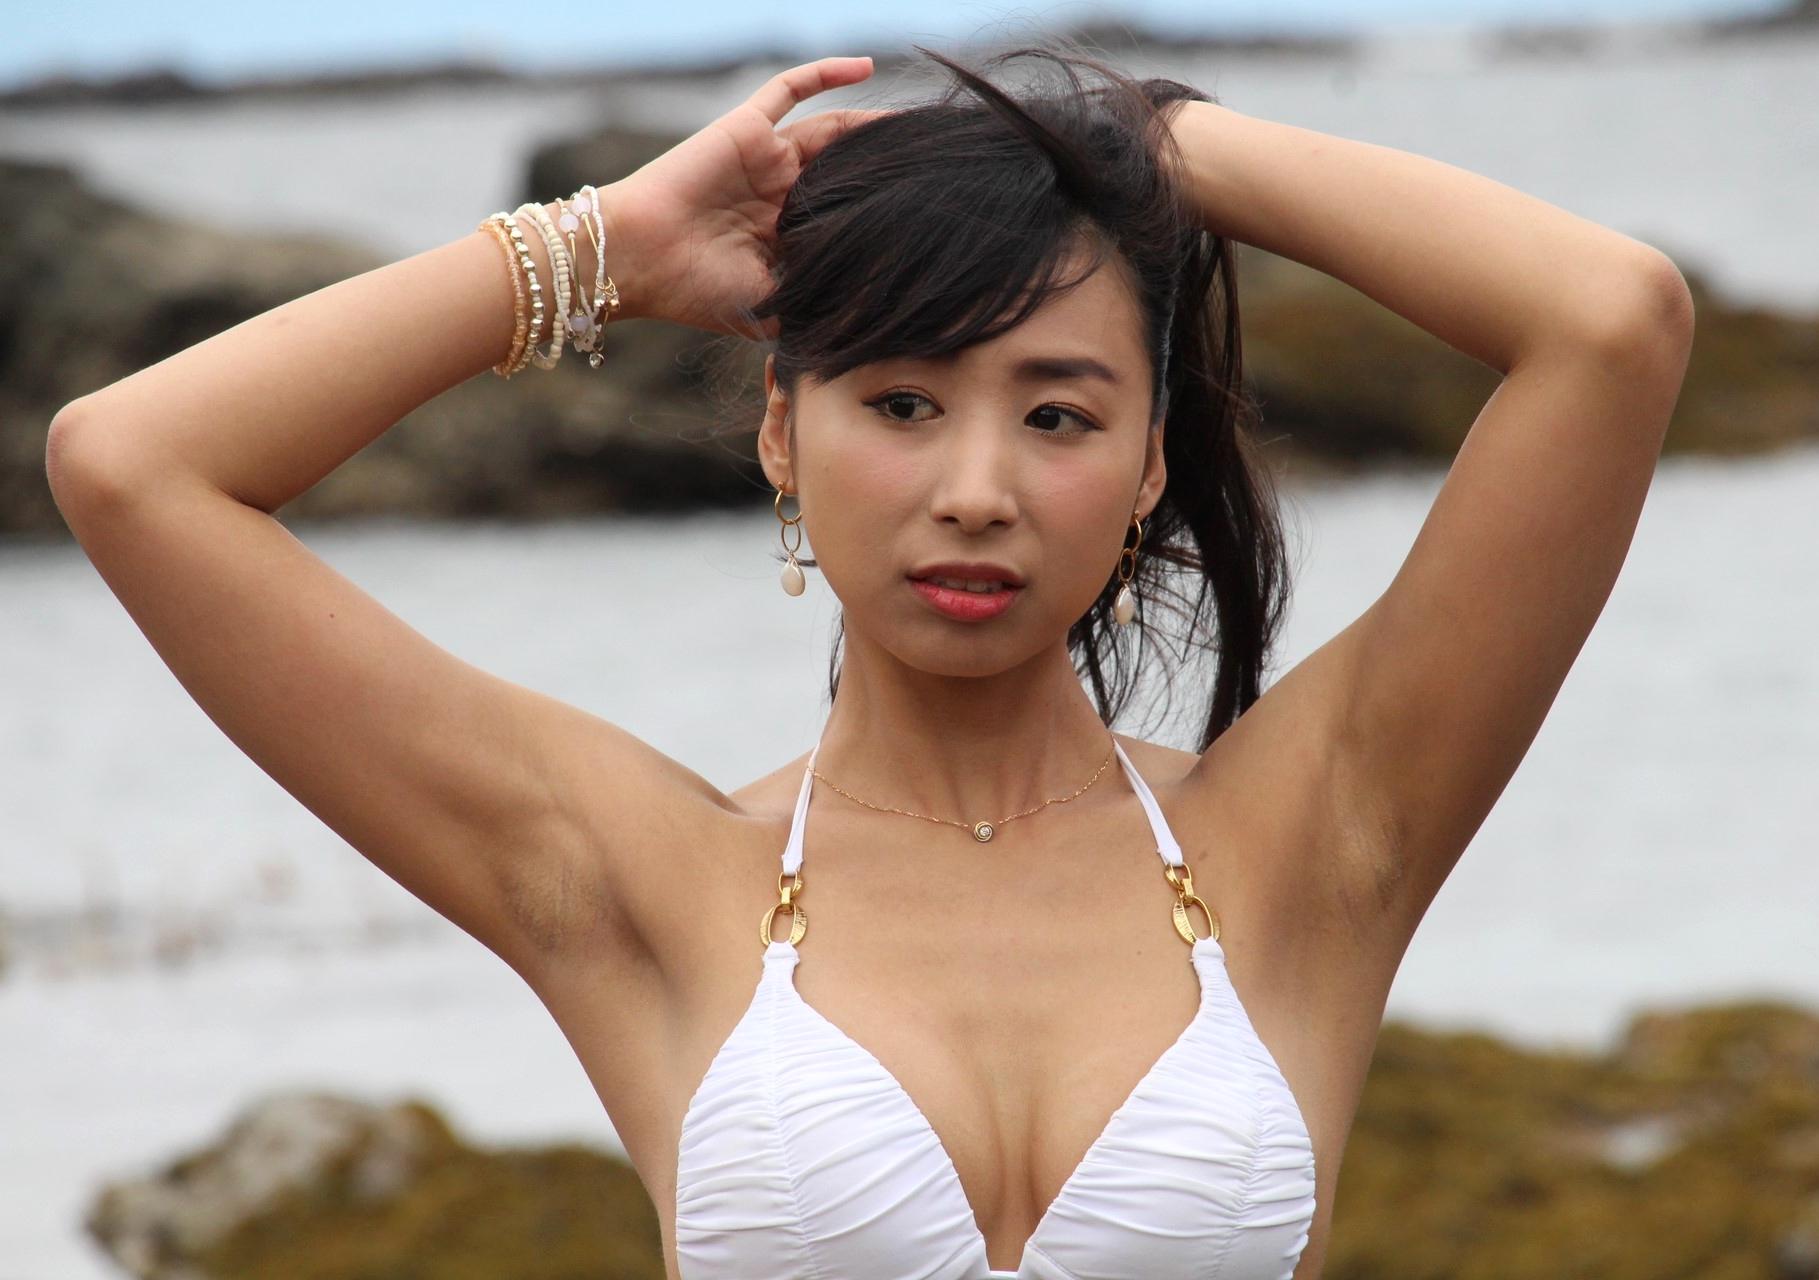 Azullyのザラ腋 (30)